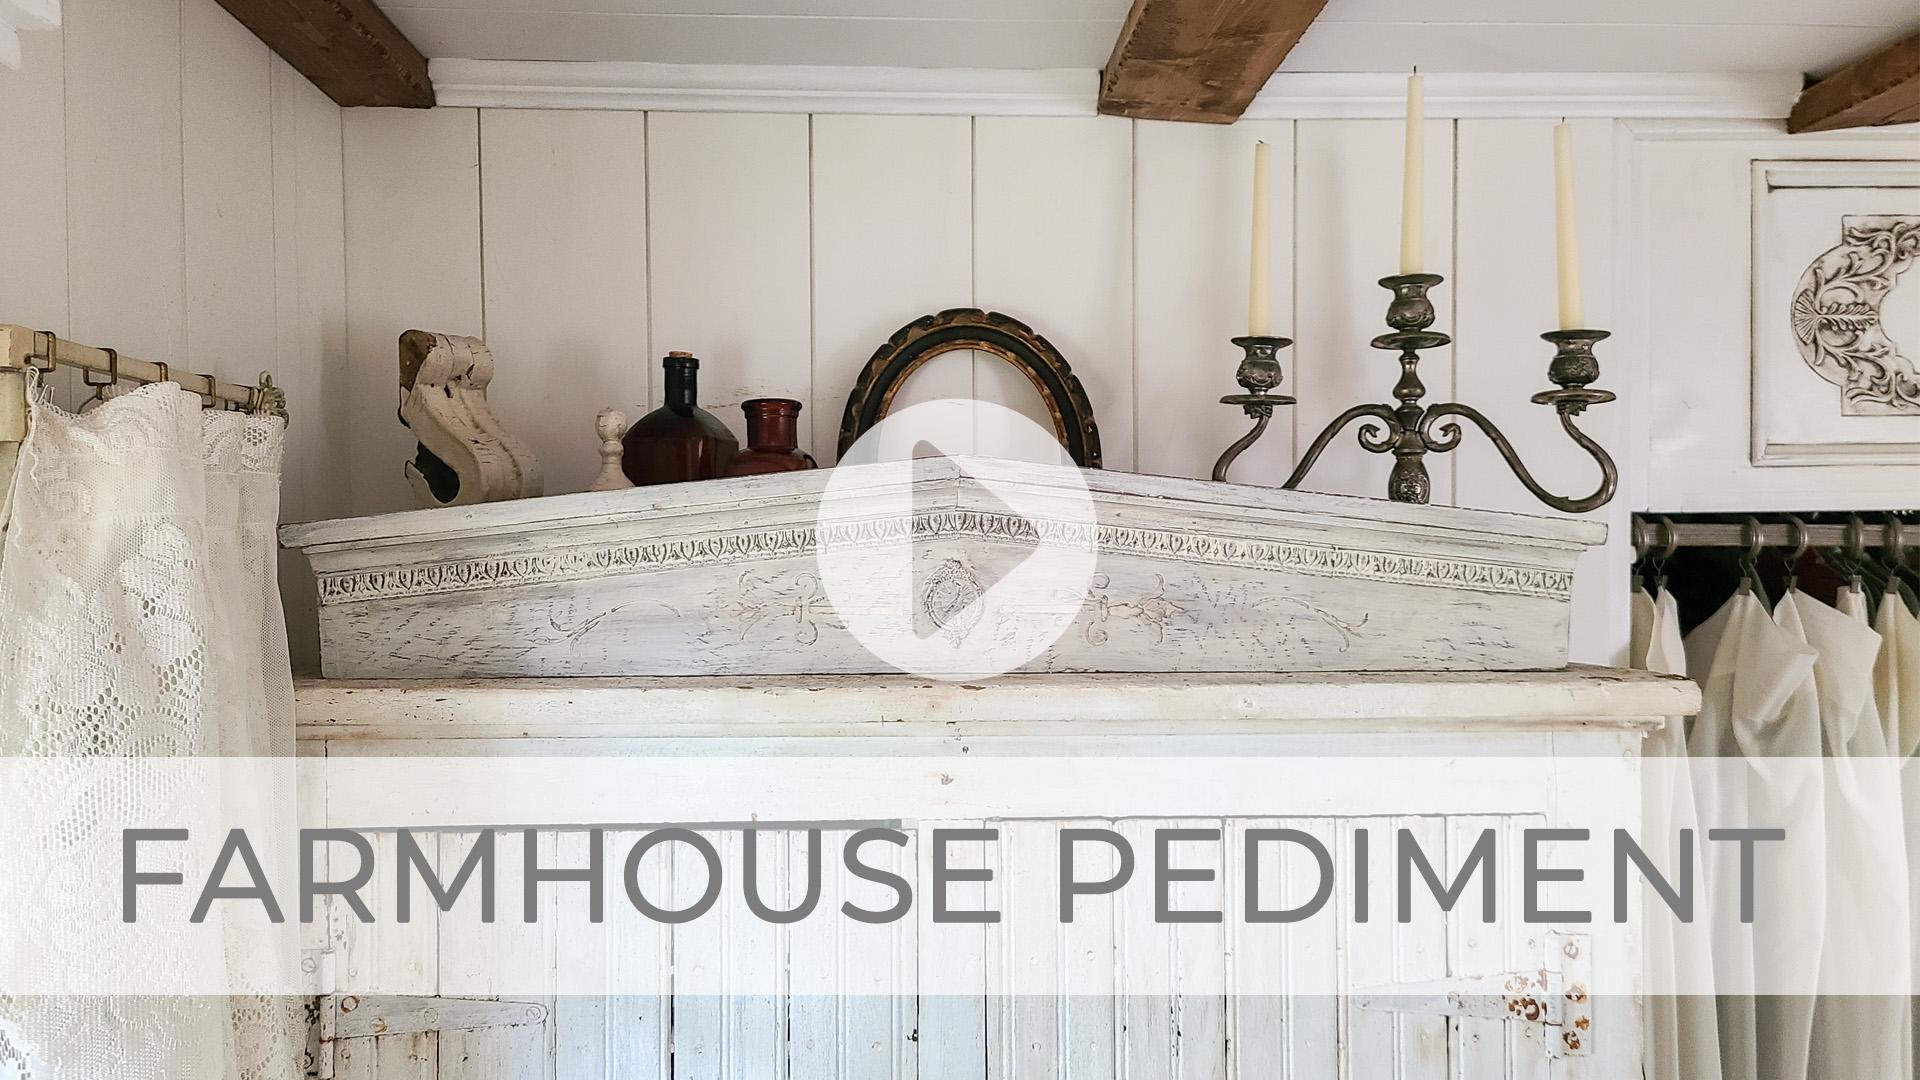 DIY Farmhouse Pediment Tutorial Video by Larissa of Prodigal Pieces | prodigalpieces.com #prodigalpieces